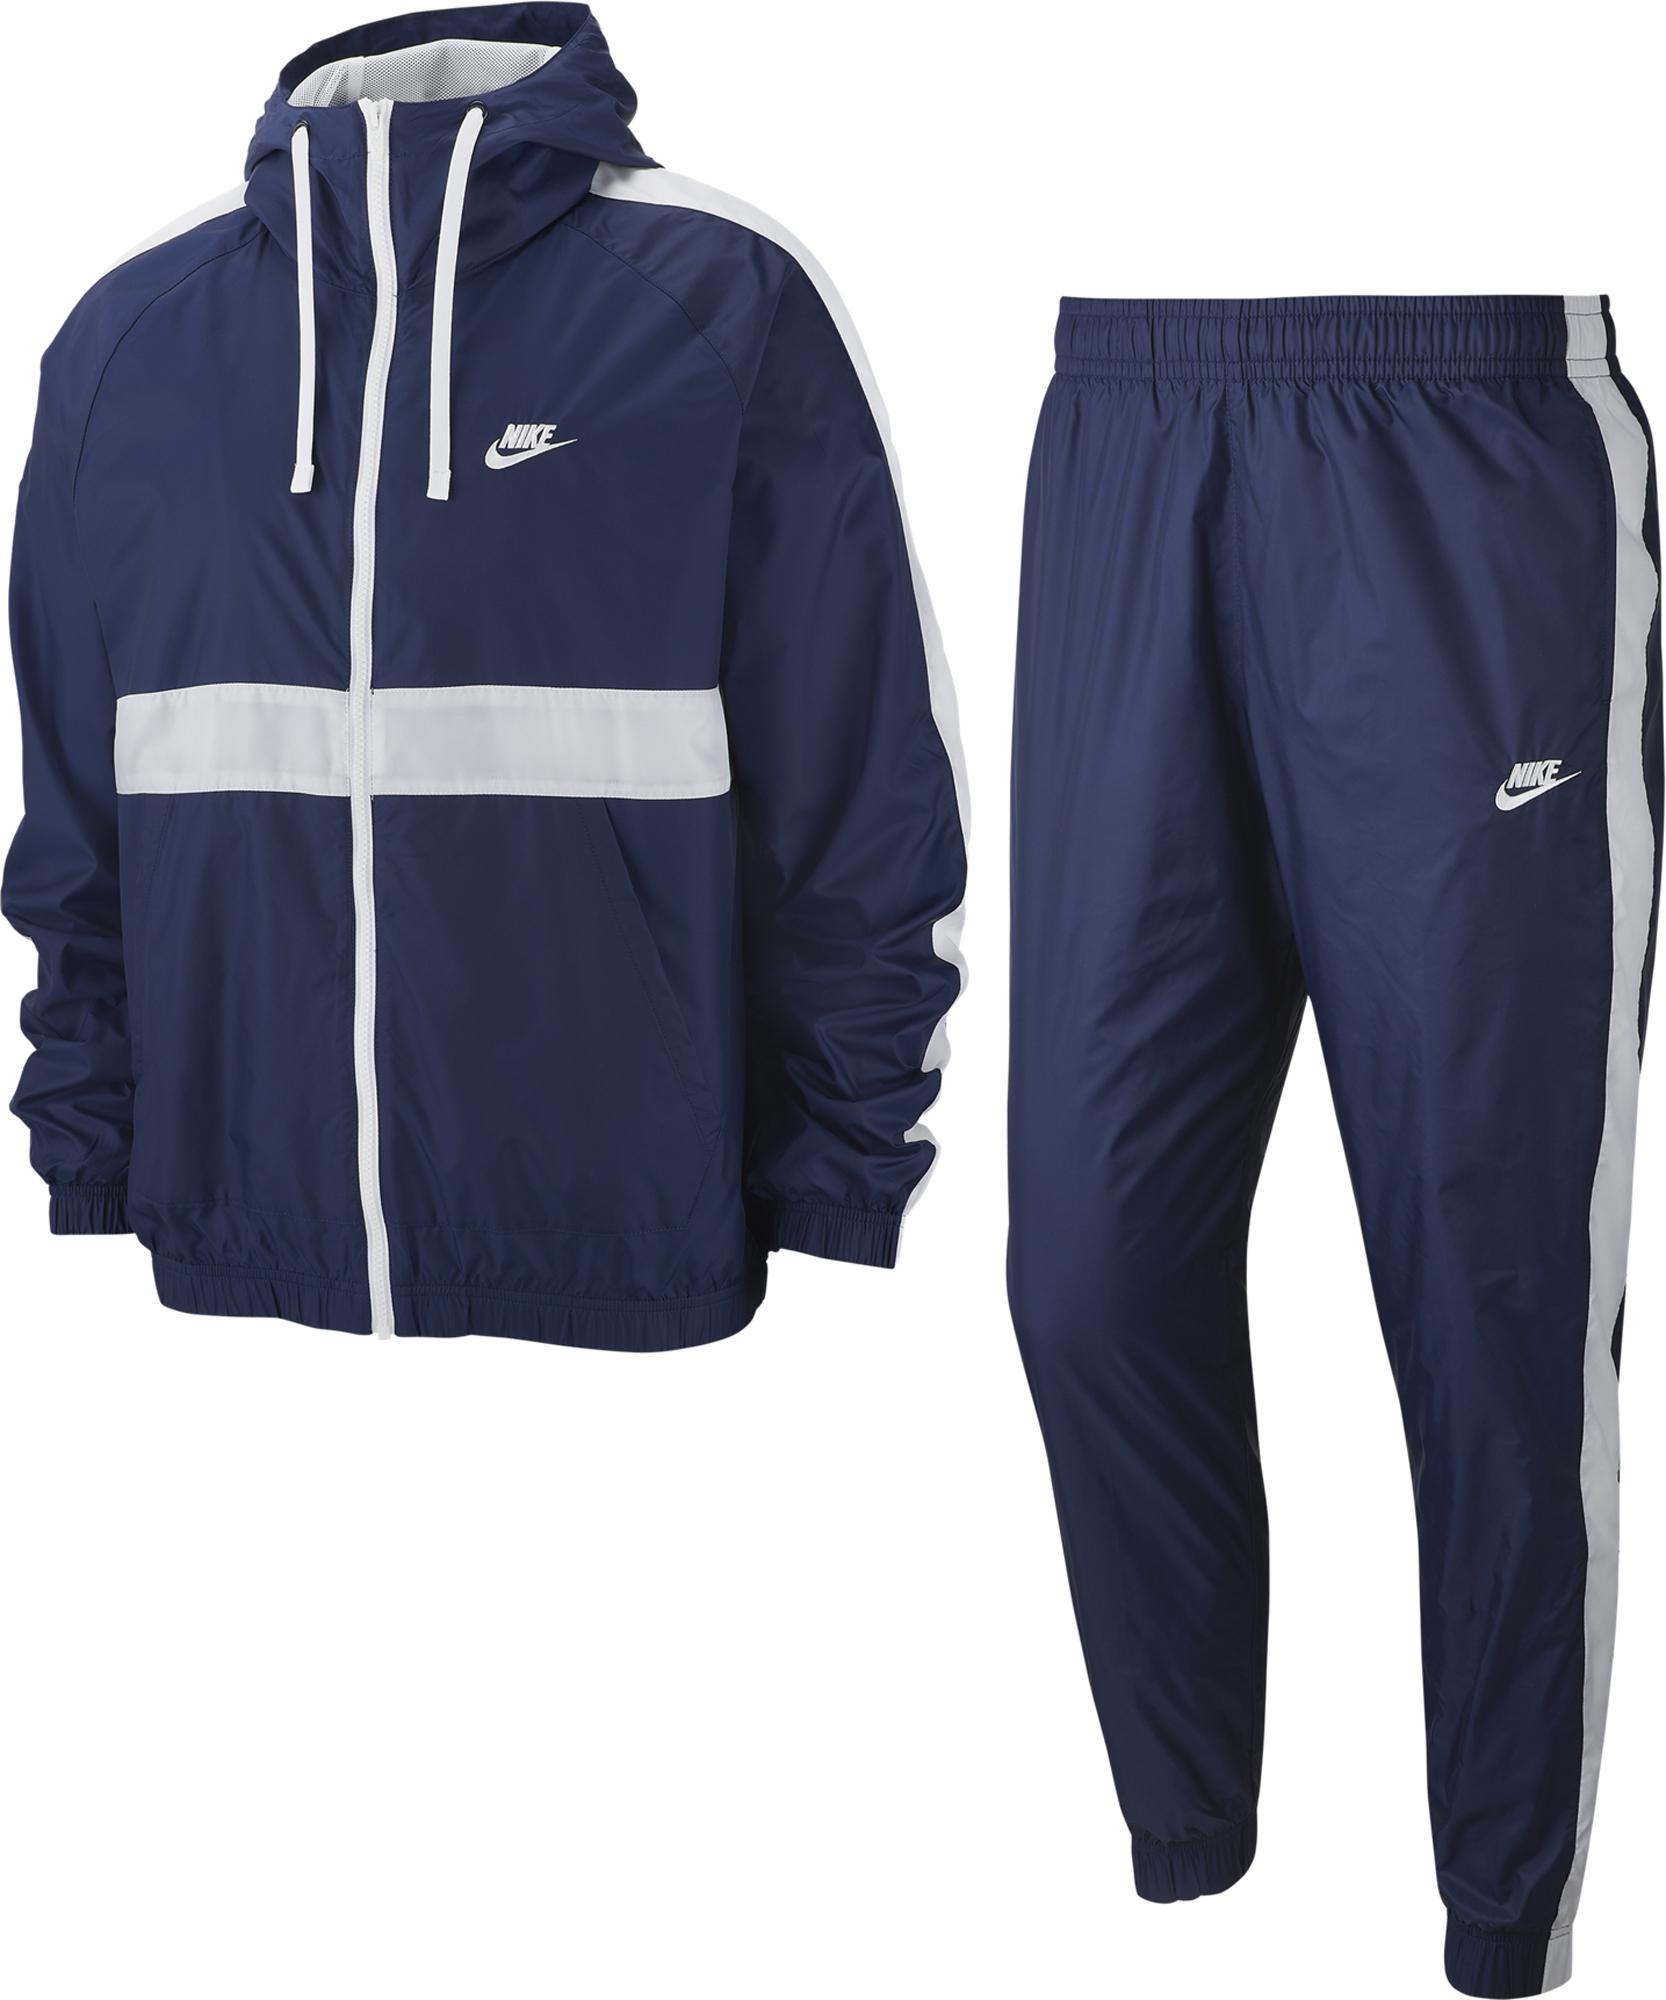 Nike Спортивный костюм мужской Sportswear, размер 54-56